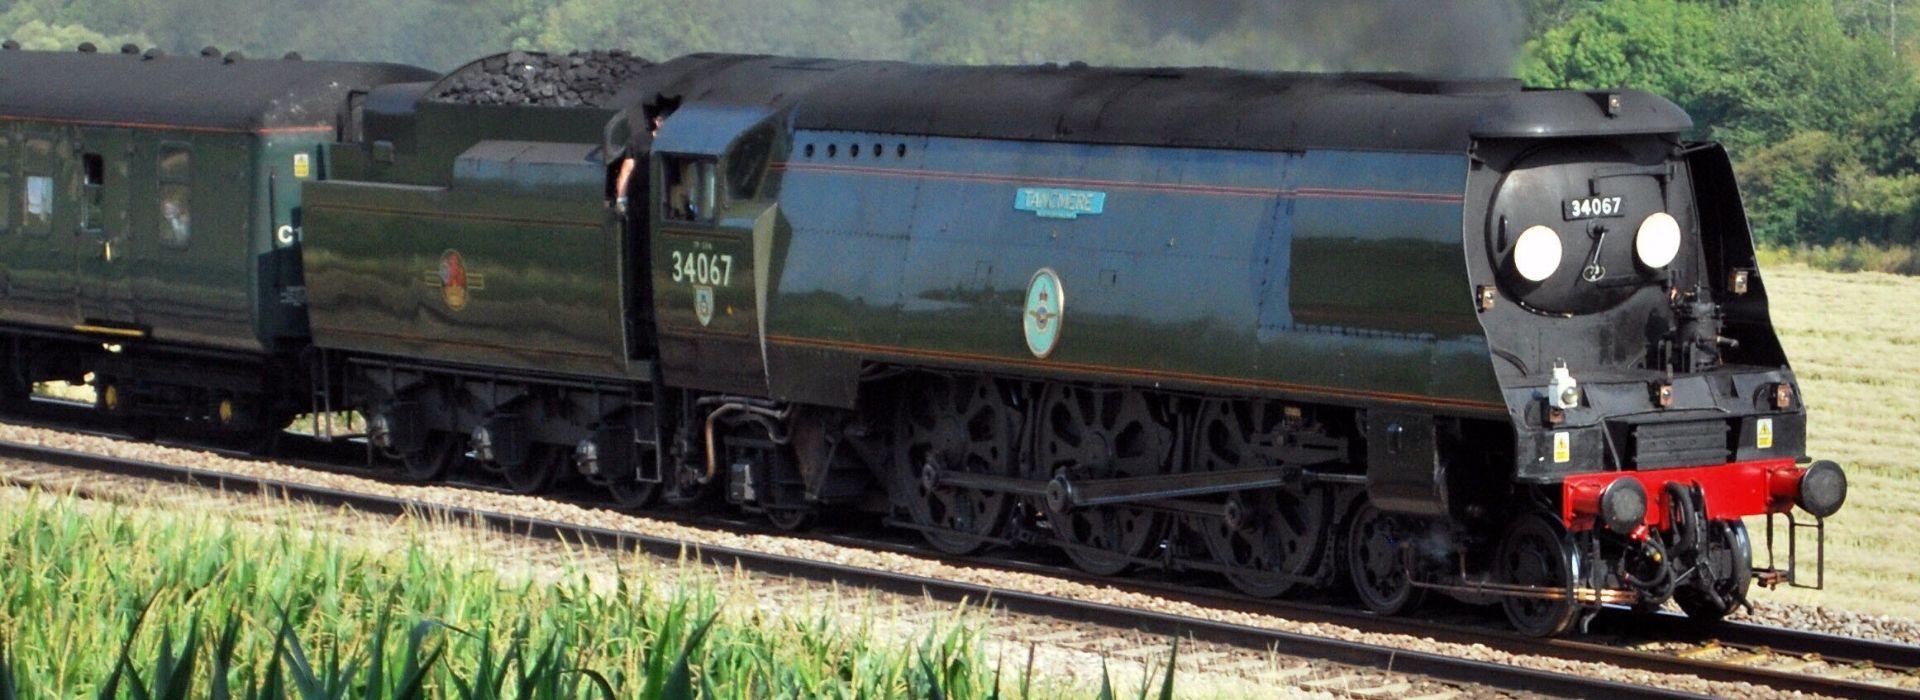 34067 near Bath in September 2011. ©Hugh Llewelyn